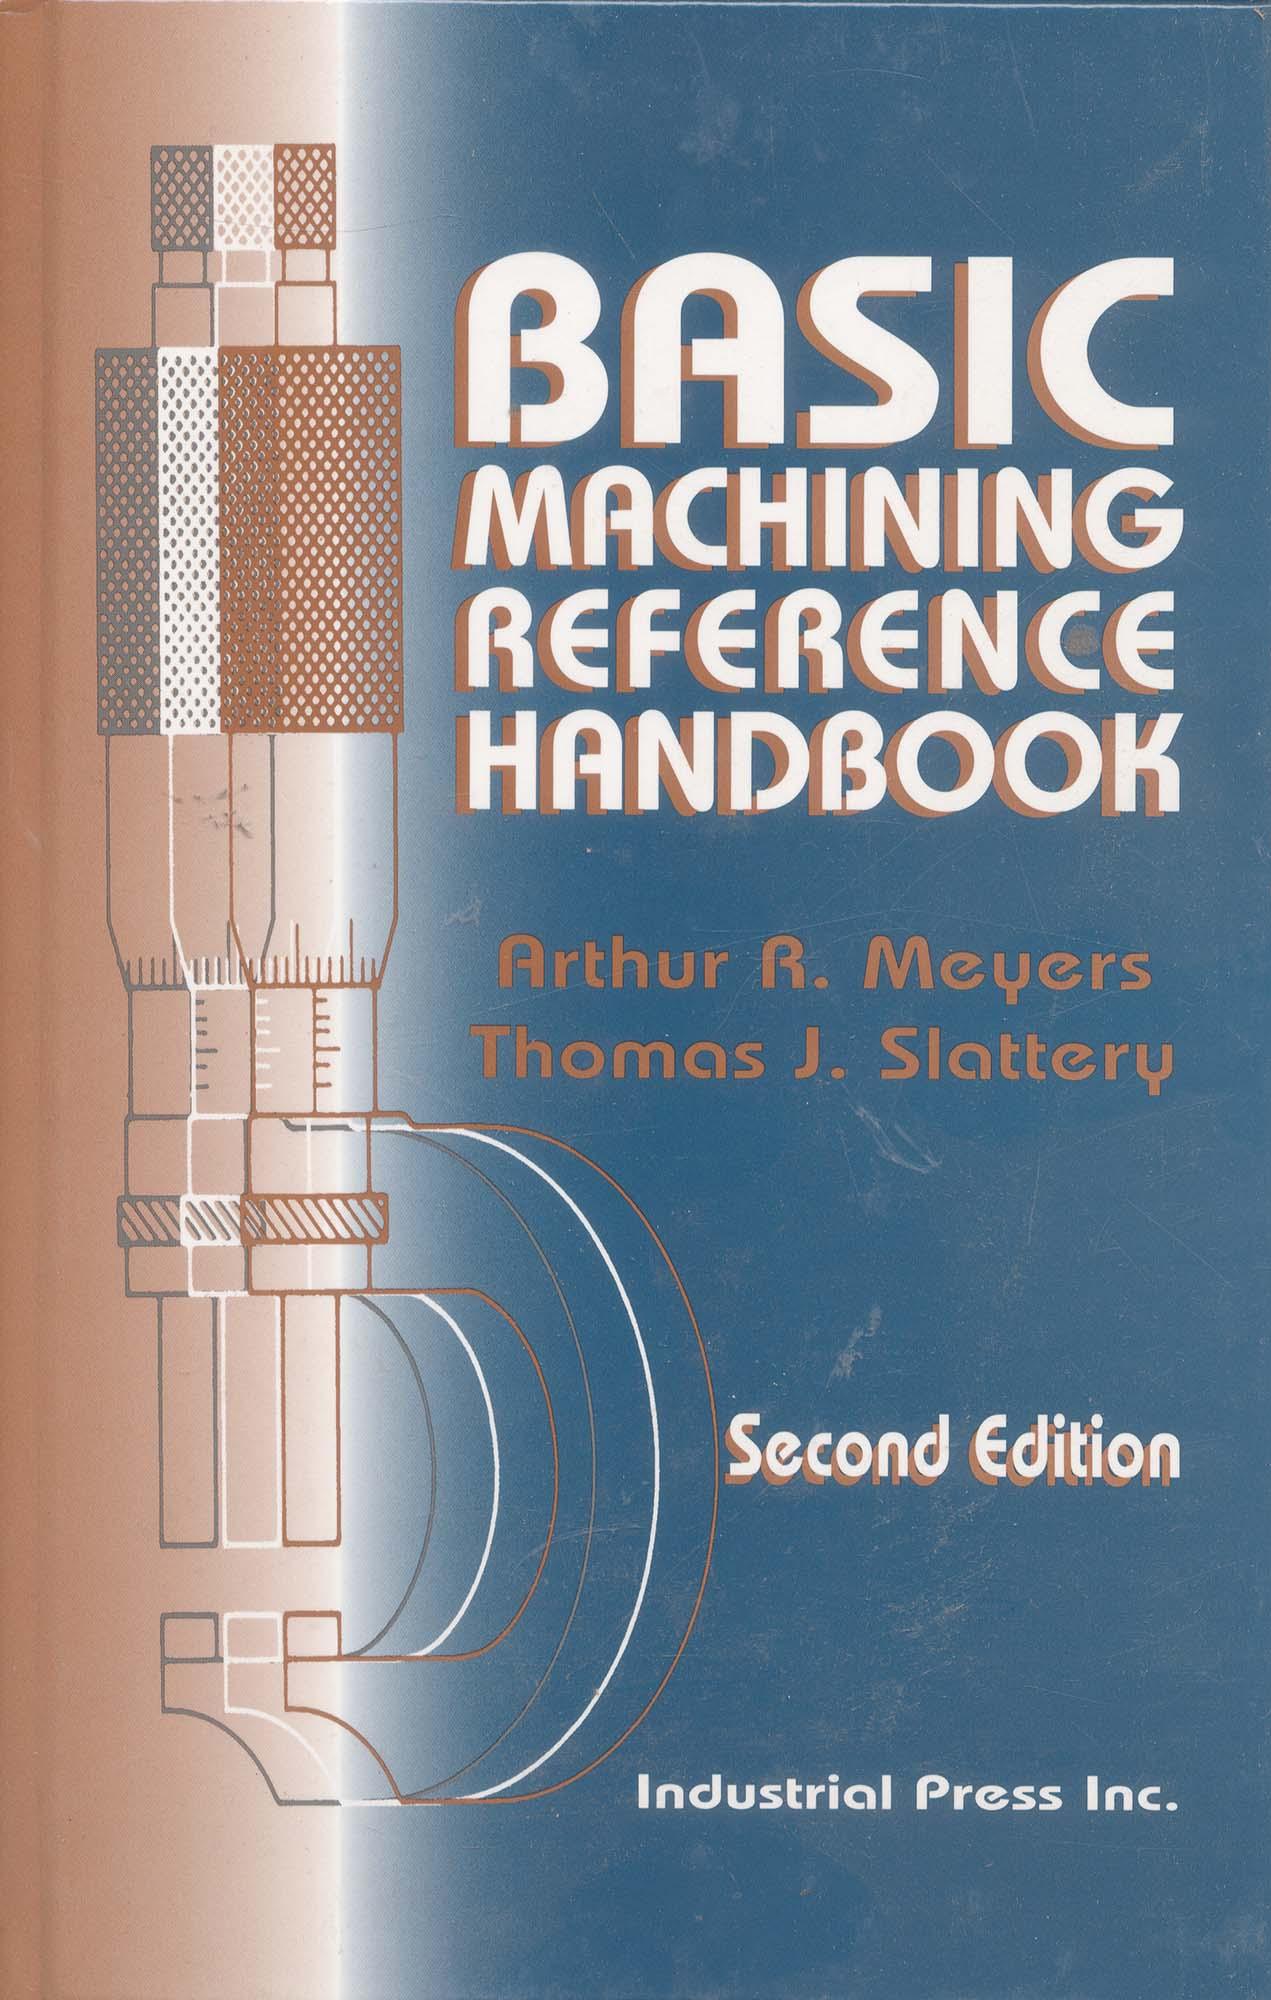 Book-Basic Machining Reference Handbook, 2nd Ed.